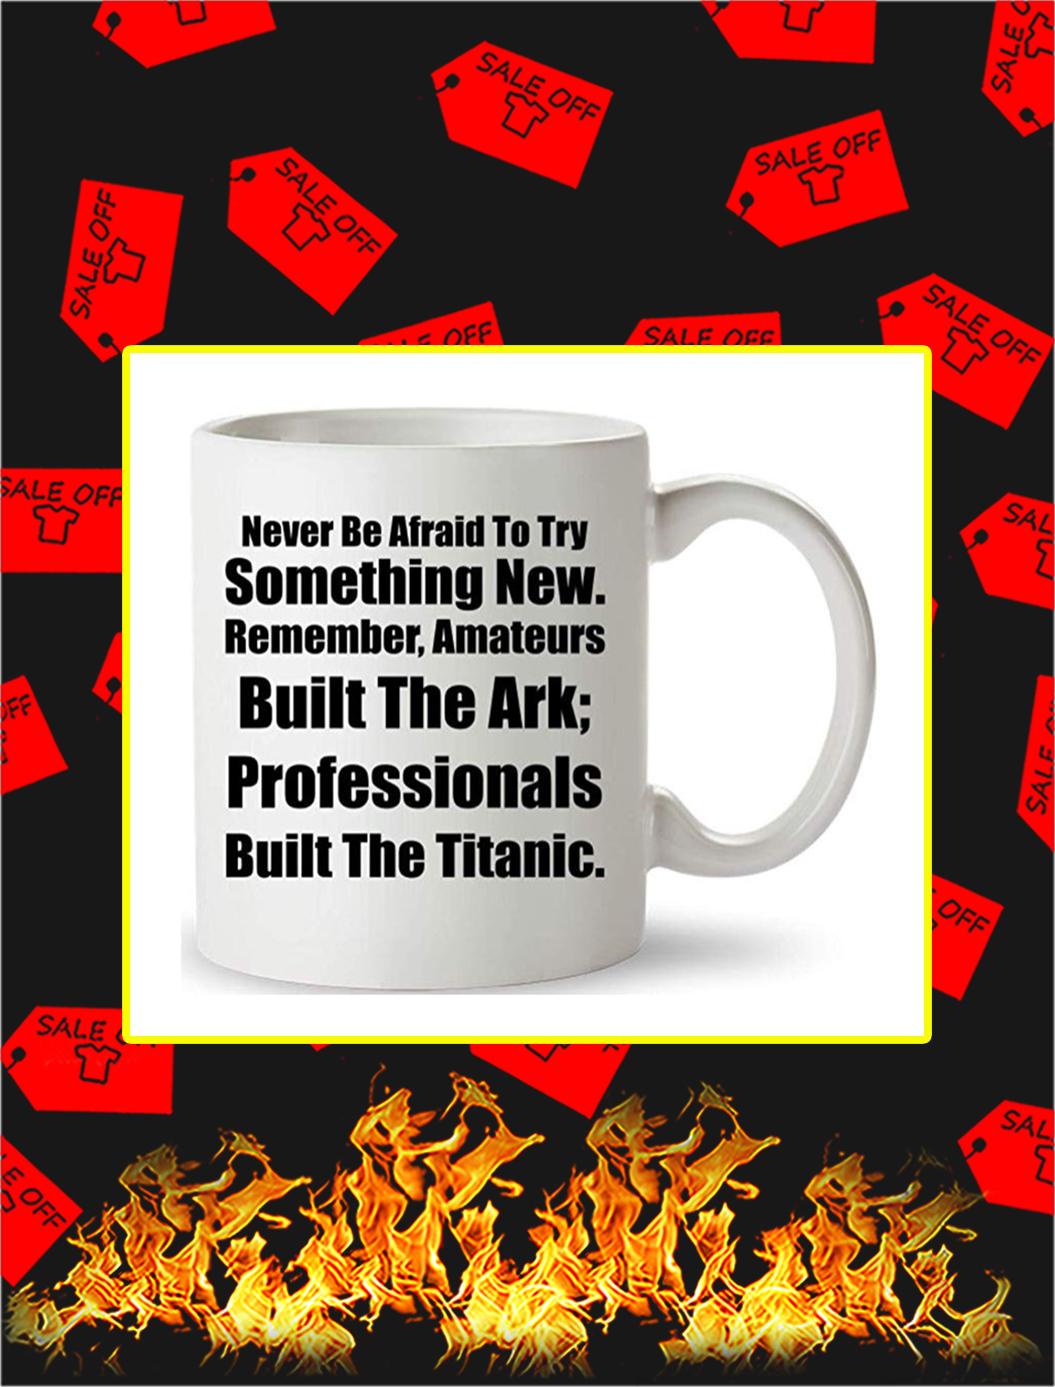 Never Be Afraid To Try Something New Mug - White